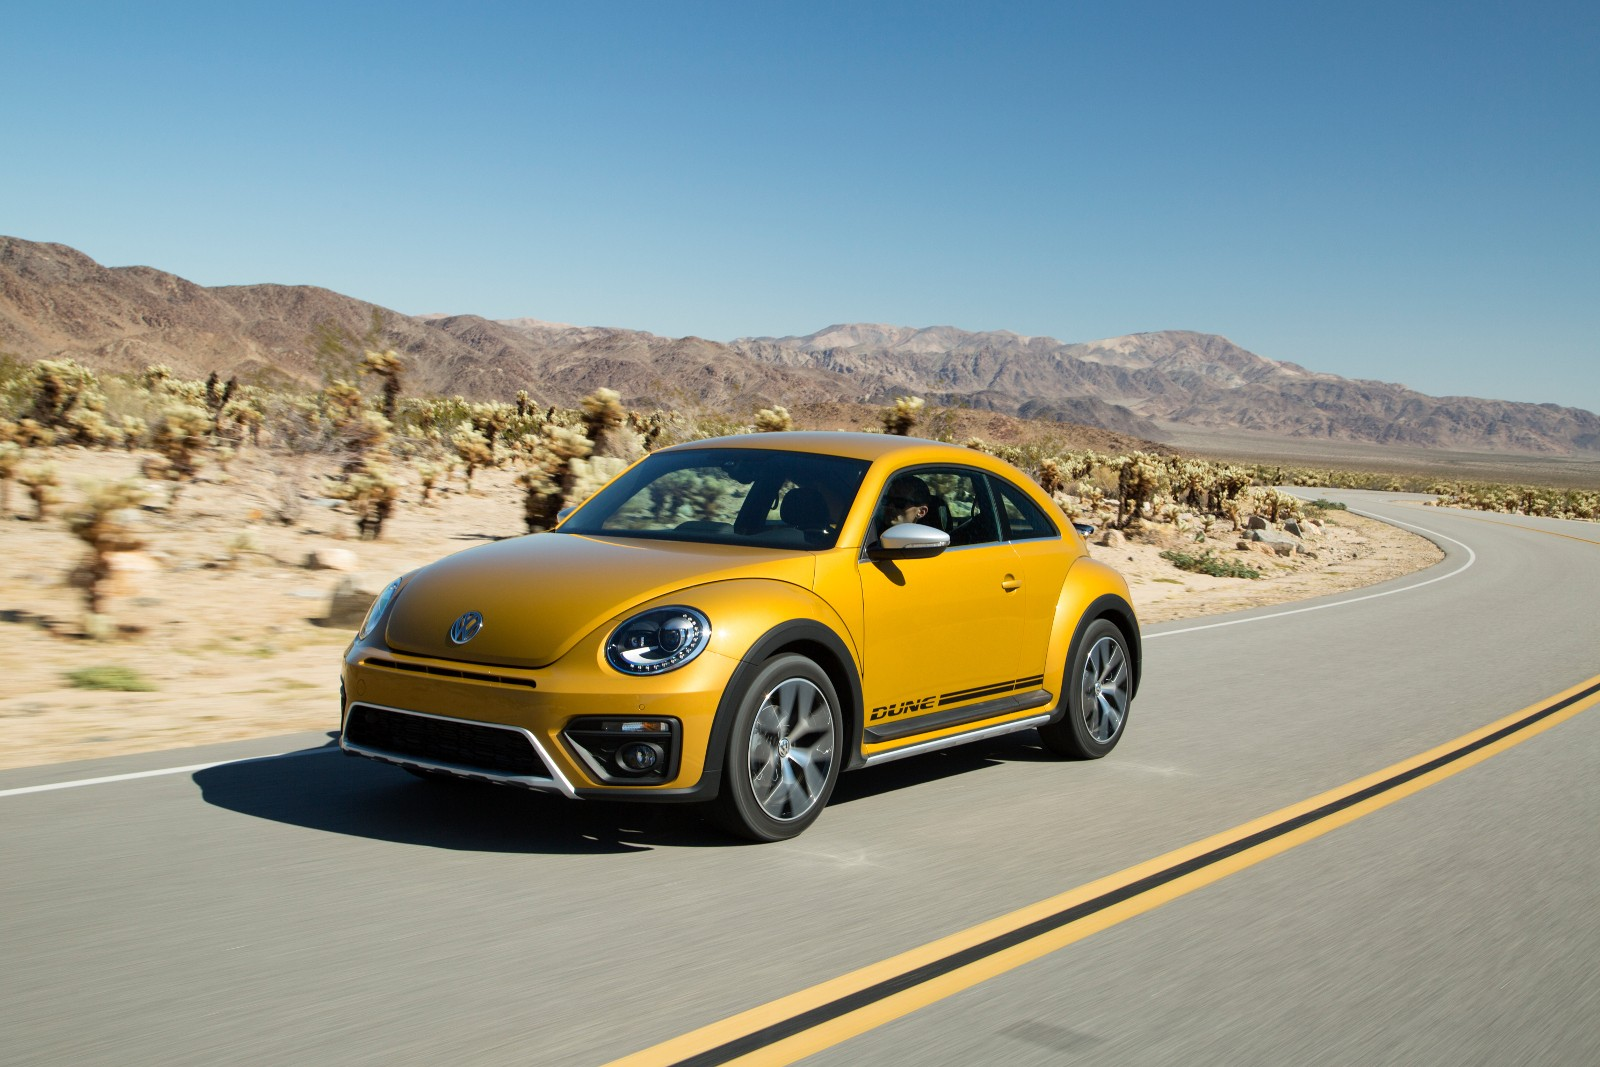 2017 Volkswagen Beetle Dune Revealed at LA Auto Show ...